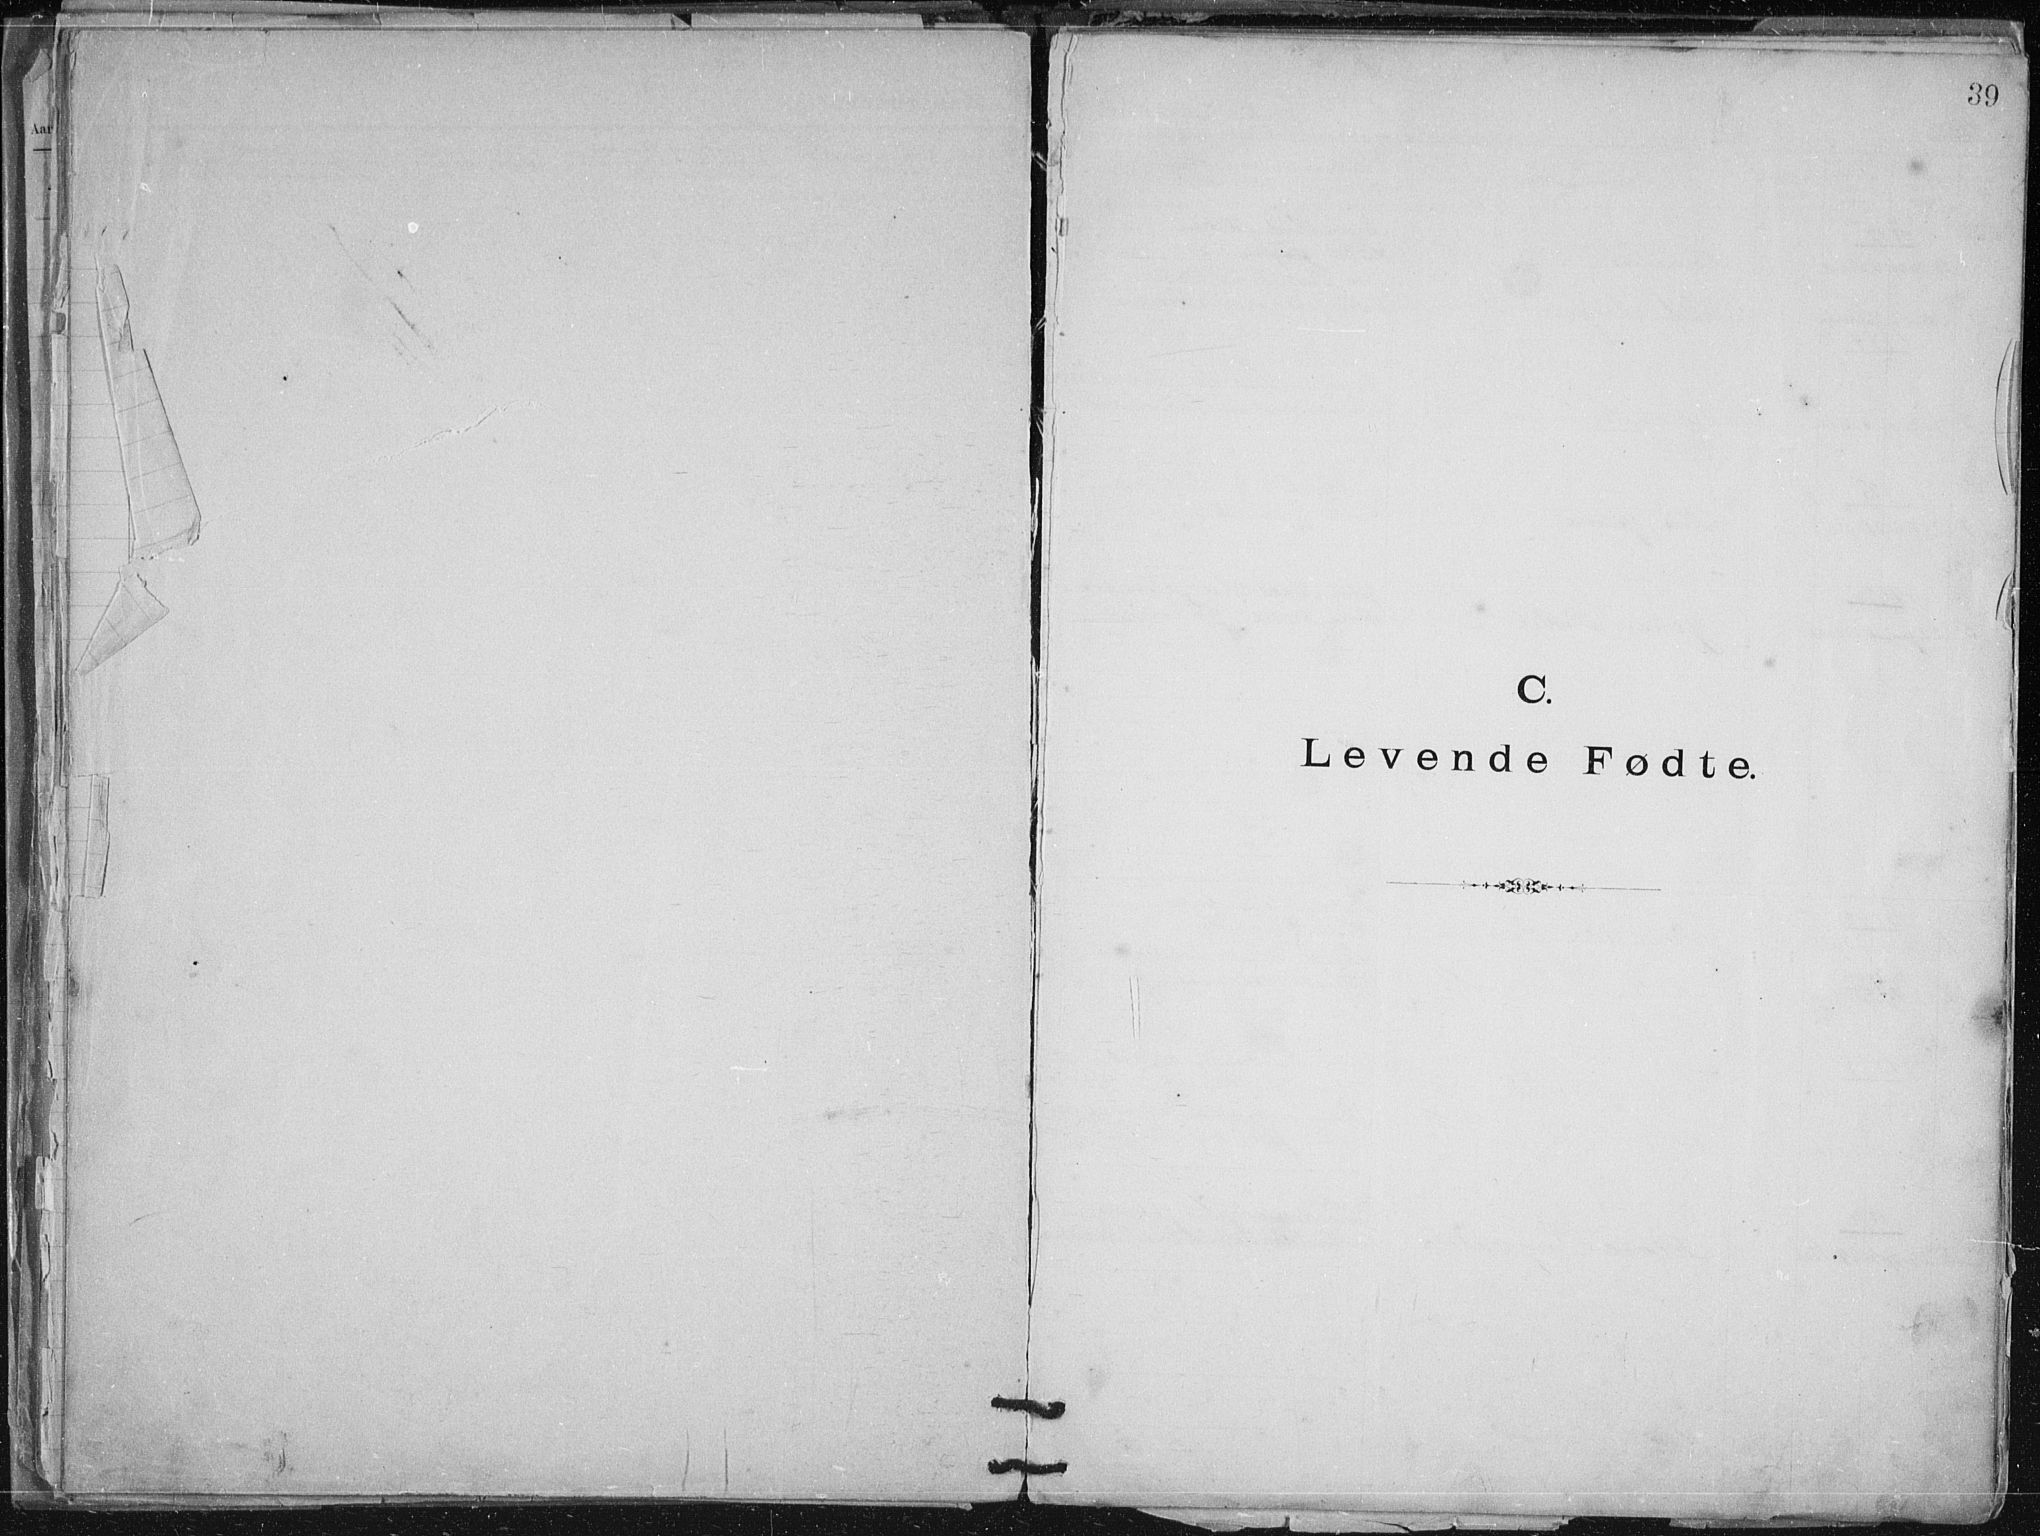 SATØ, Aune baptistmenighet, F/L0006DP: Dissenter register no. 6, 1887-1939, p. 39